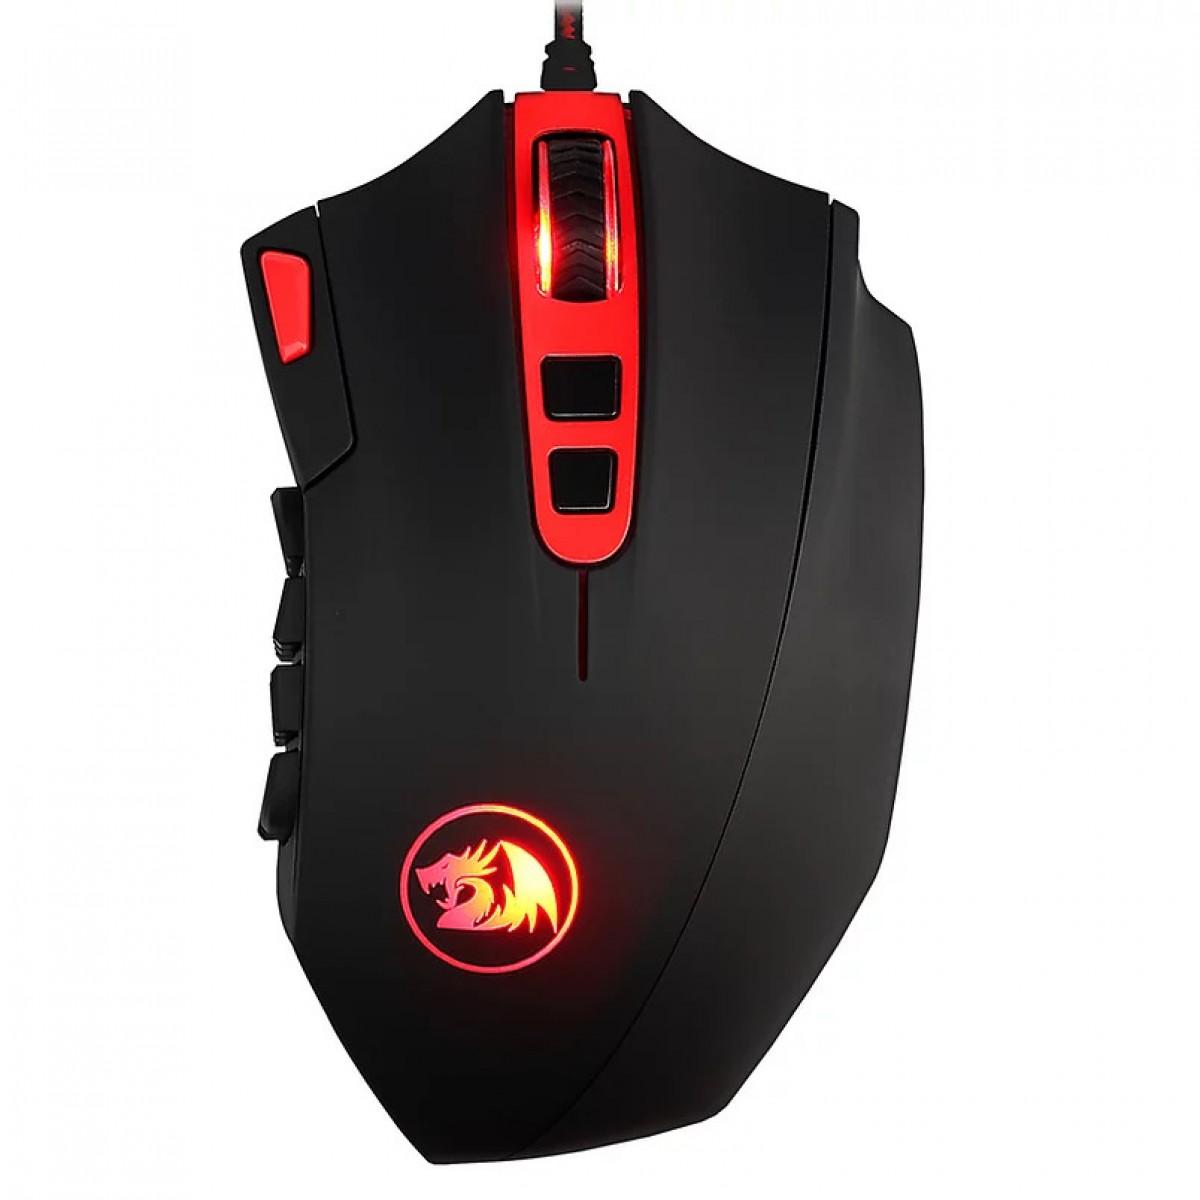 Mouse Gamer Redragon Perdition 3, 12400 DPI, 18 Botões, Black, M901-2